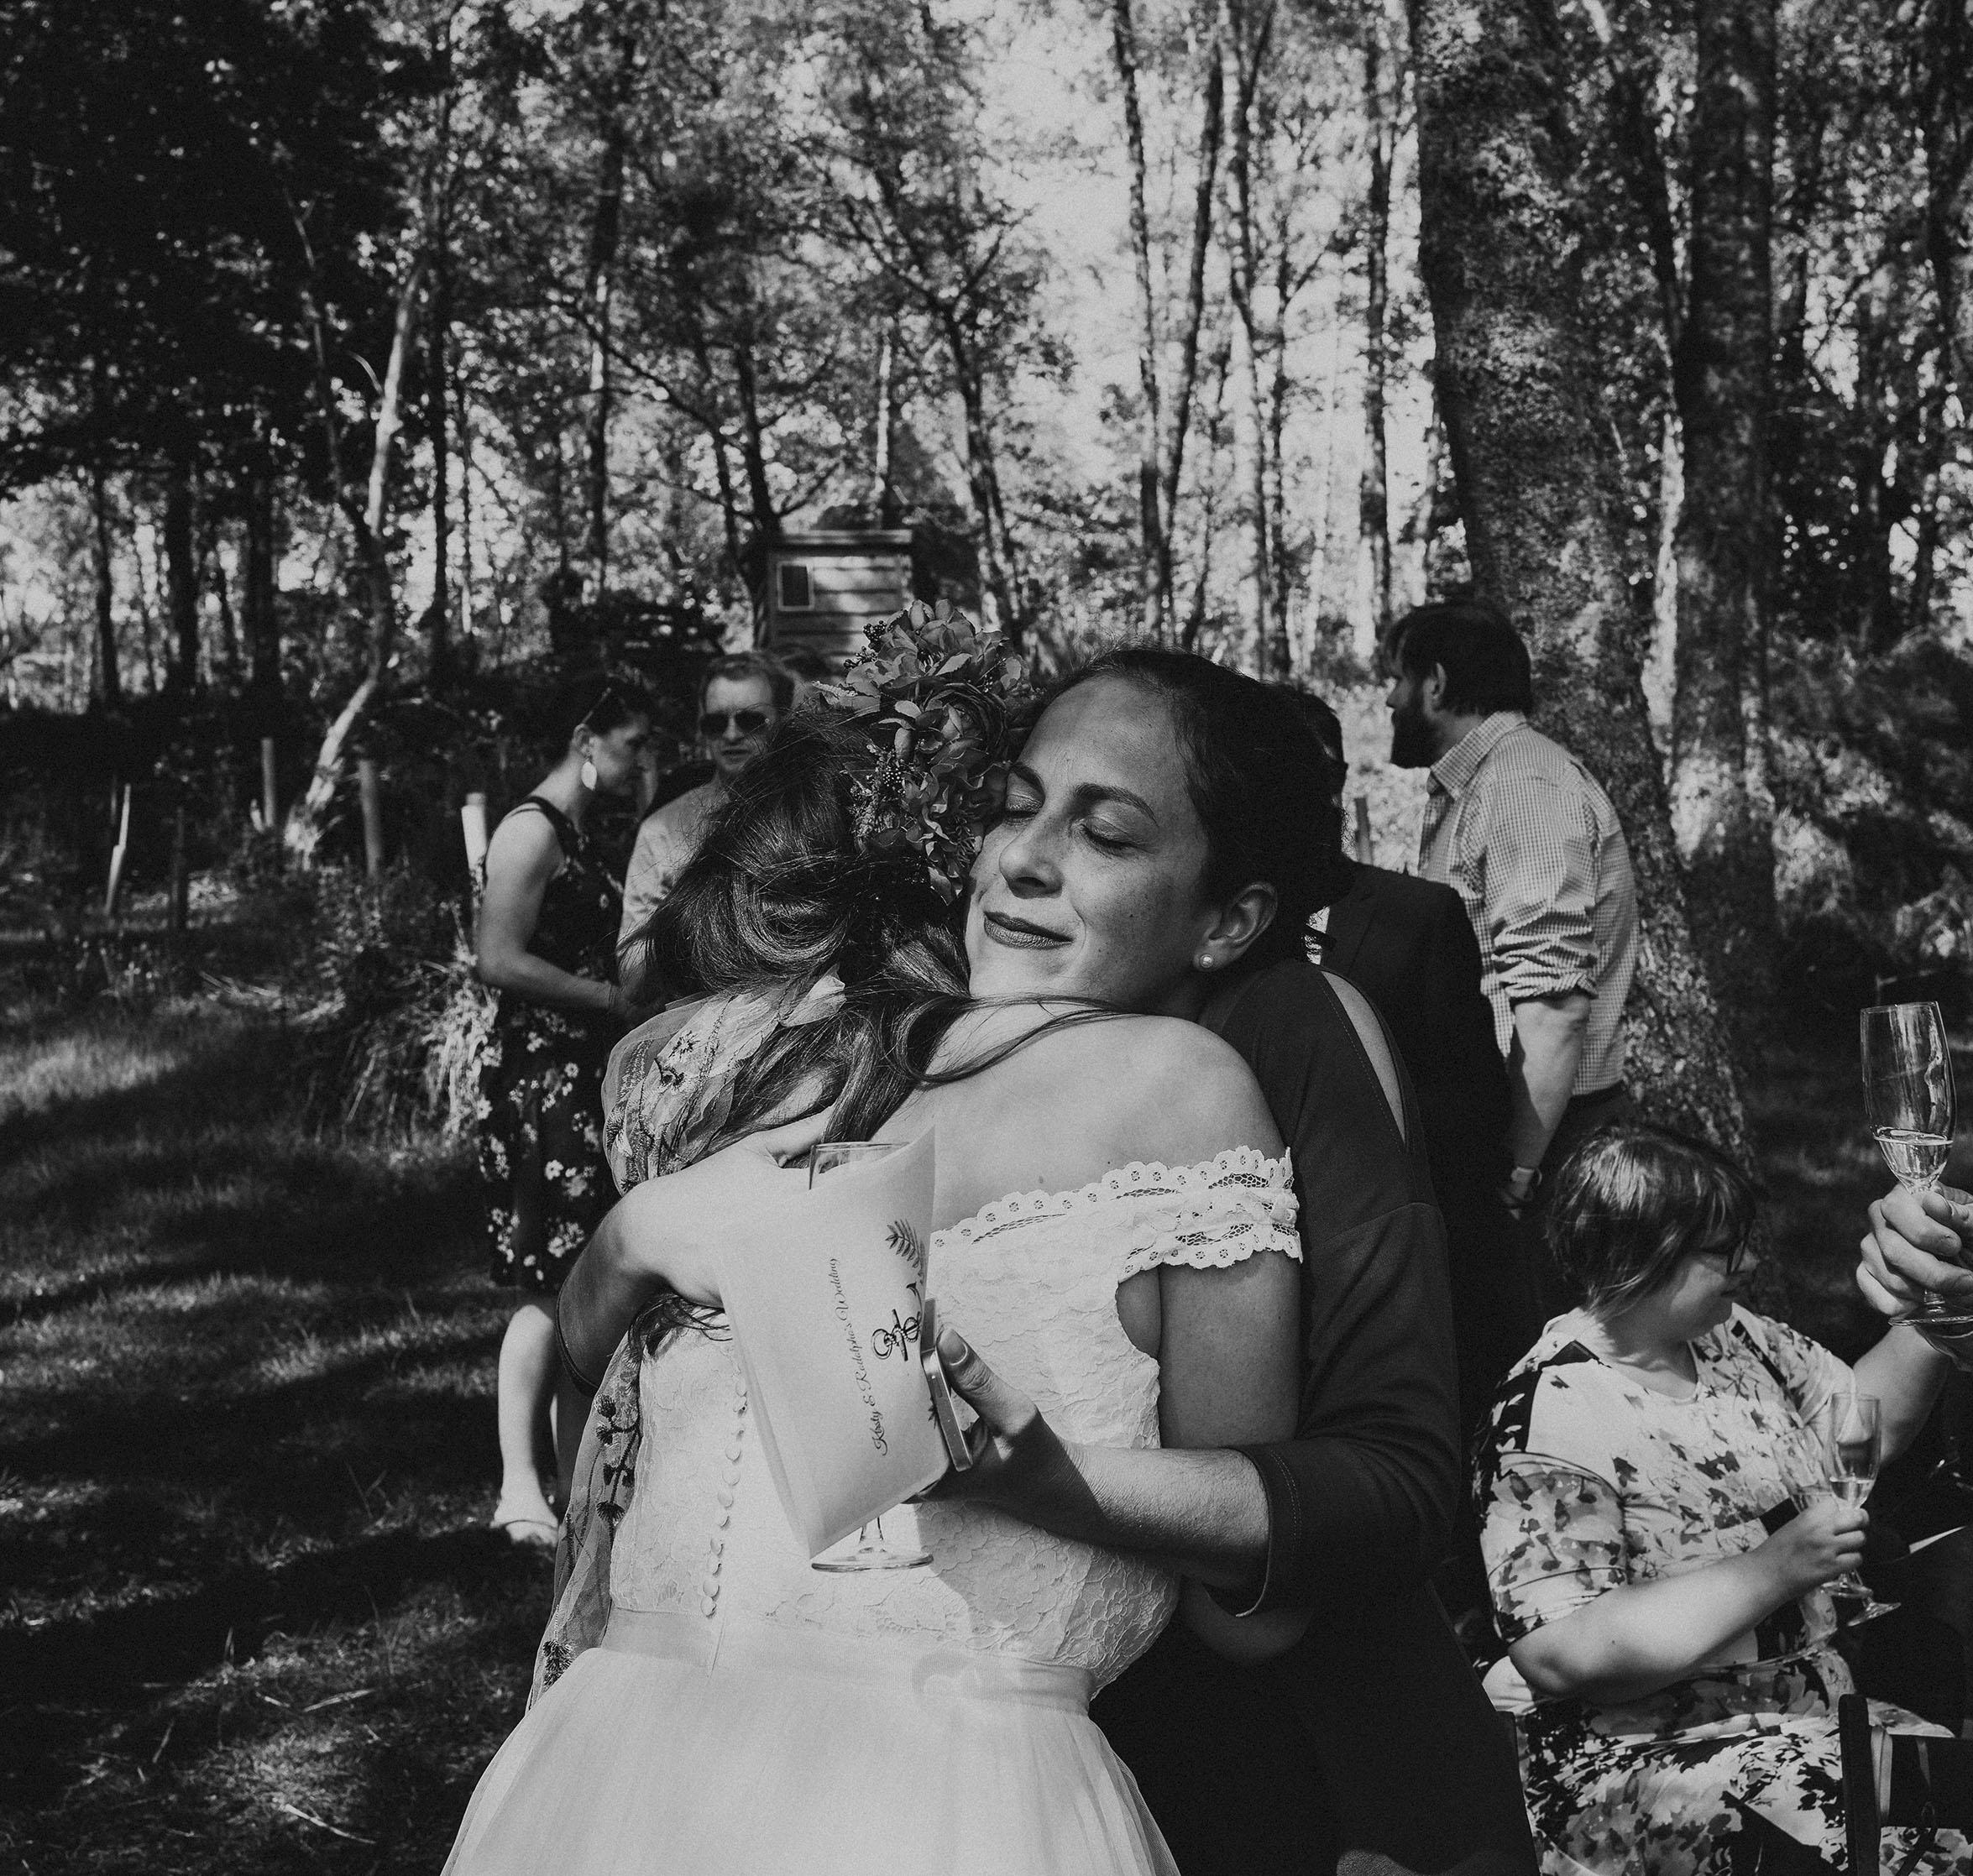 COMRIE_CROFT_WEDDINGS_PJ_PHILLIPS_PHOTOGRAPHY_92.jpg